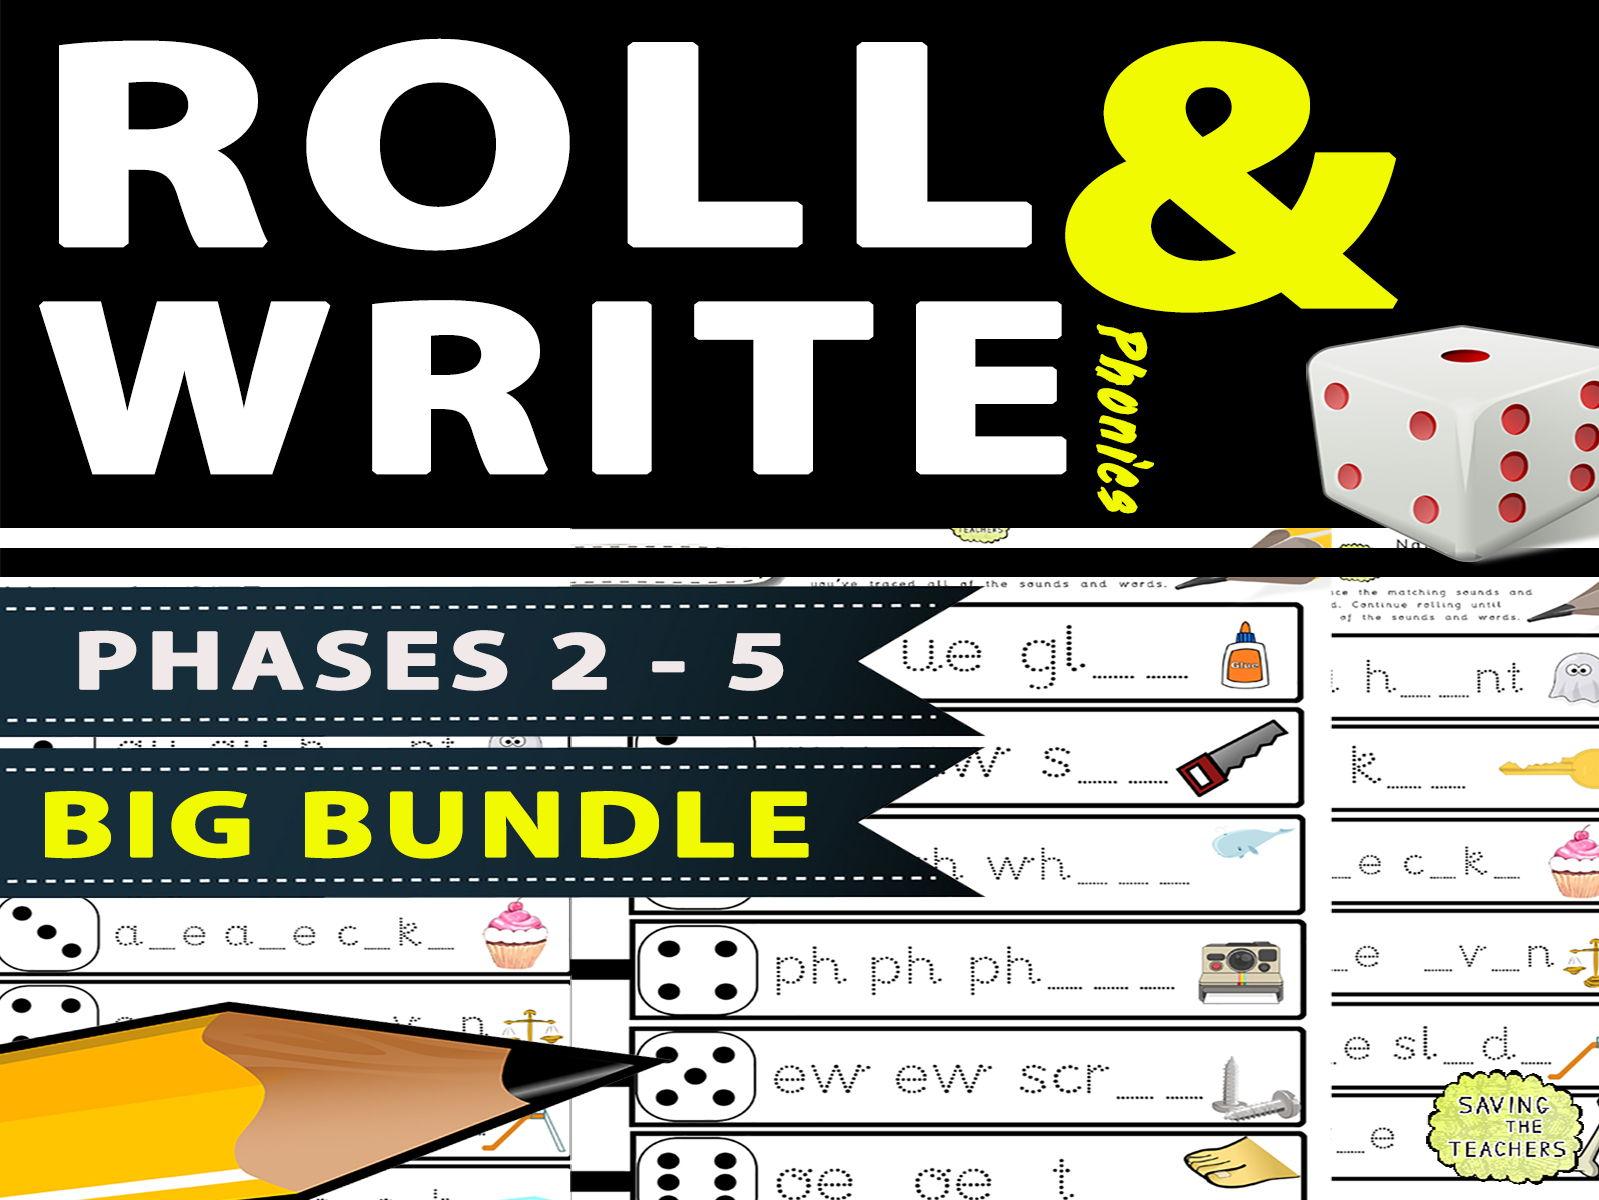 Phase 2 - 5 Phonics Handwriting / Spelling Dice Game BUNDLE